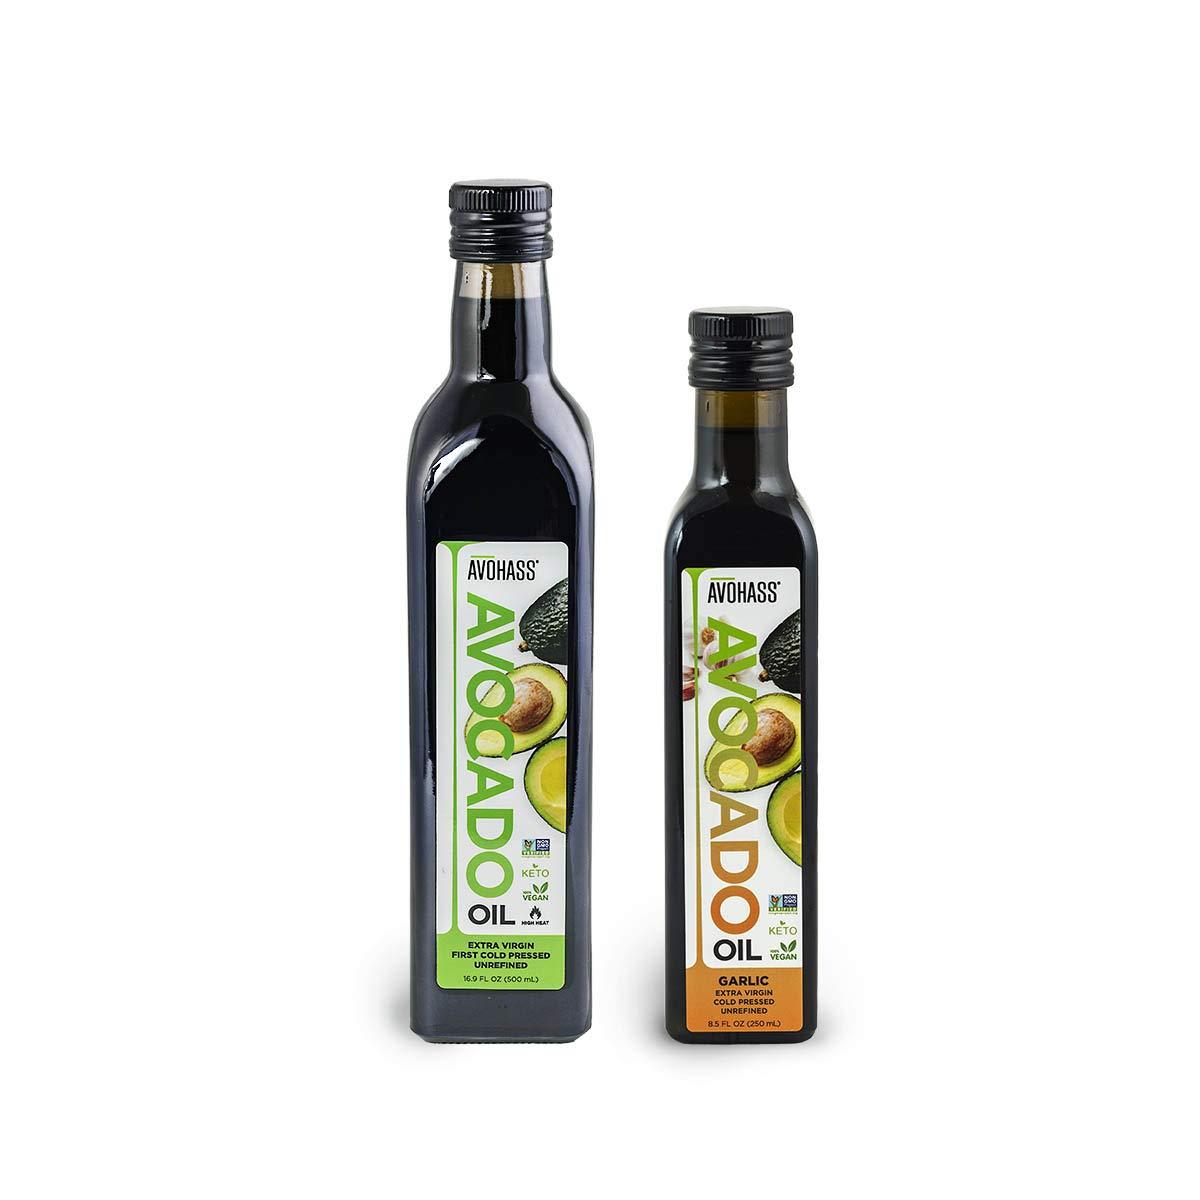 Avohass Portland Mall New Zealand Extra Virgin Avocado Oz Oil a Fl Bottle Outlet sale feature 16.9